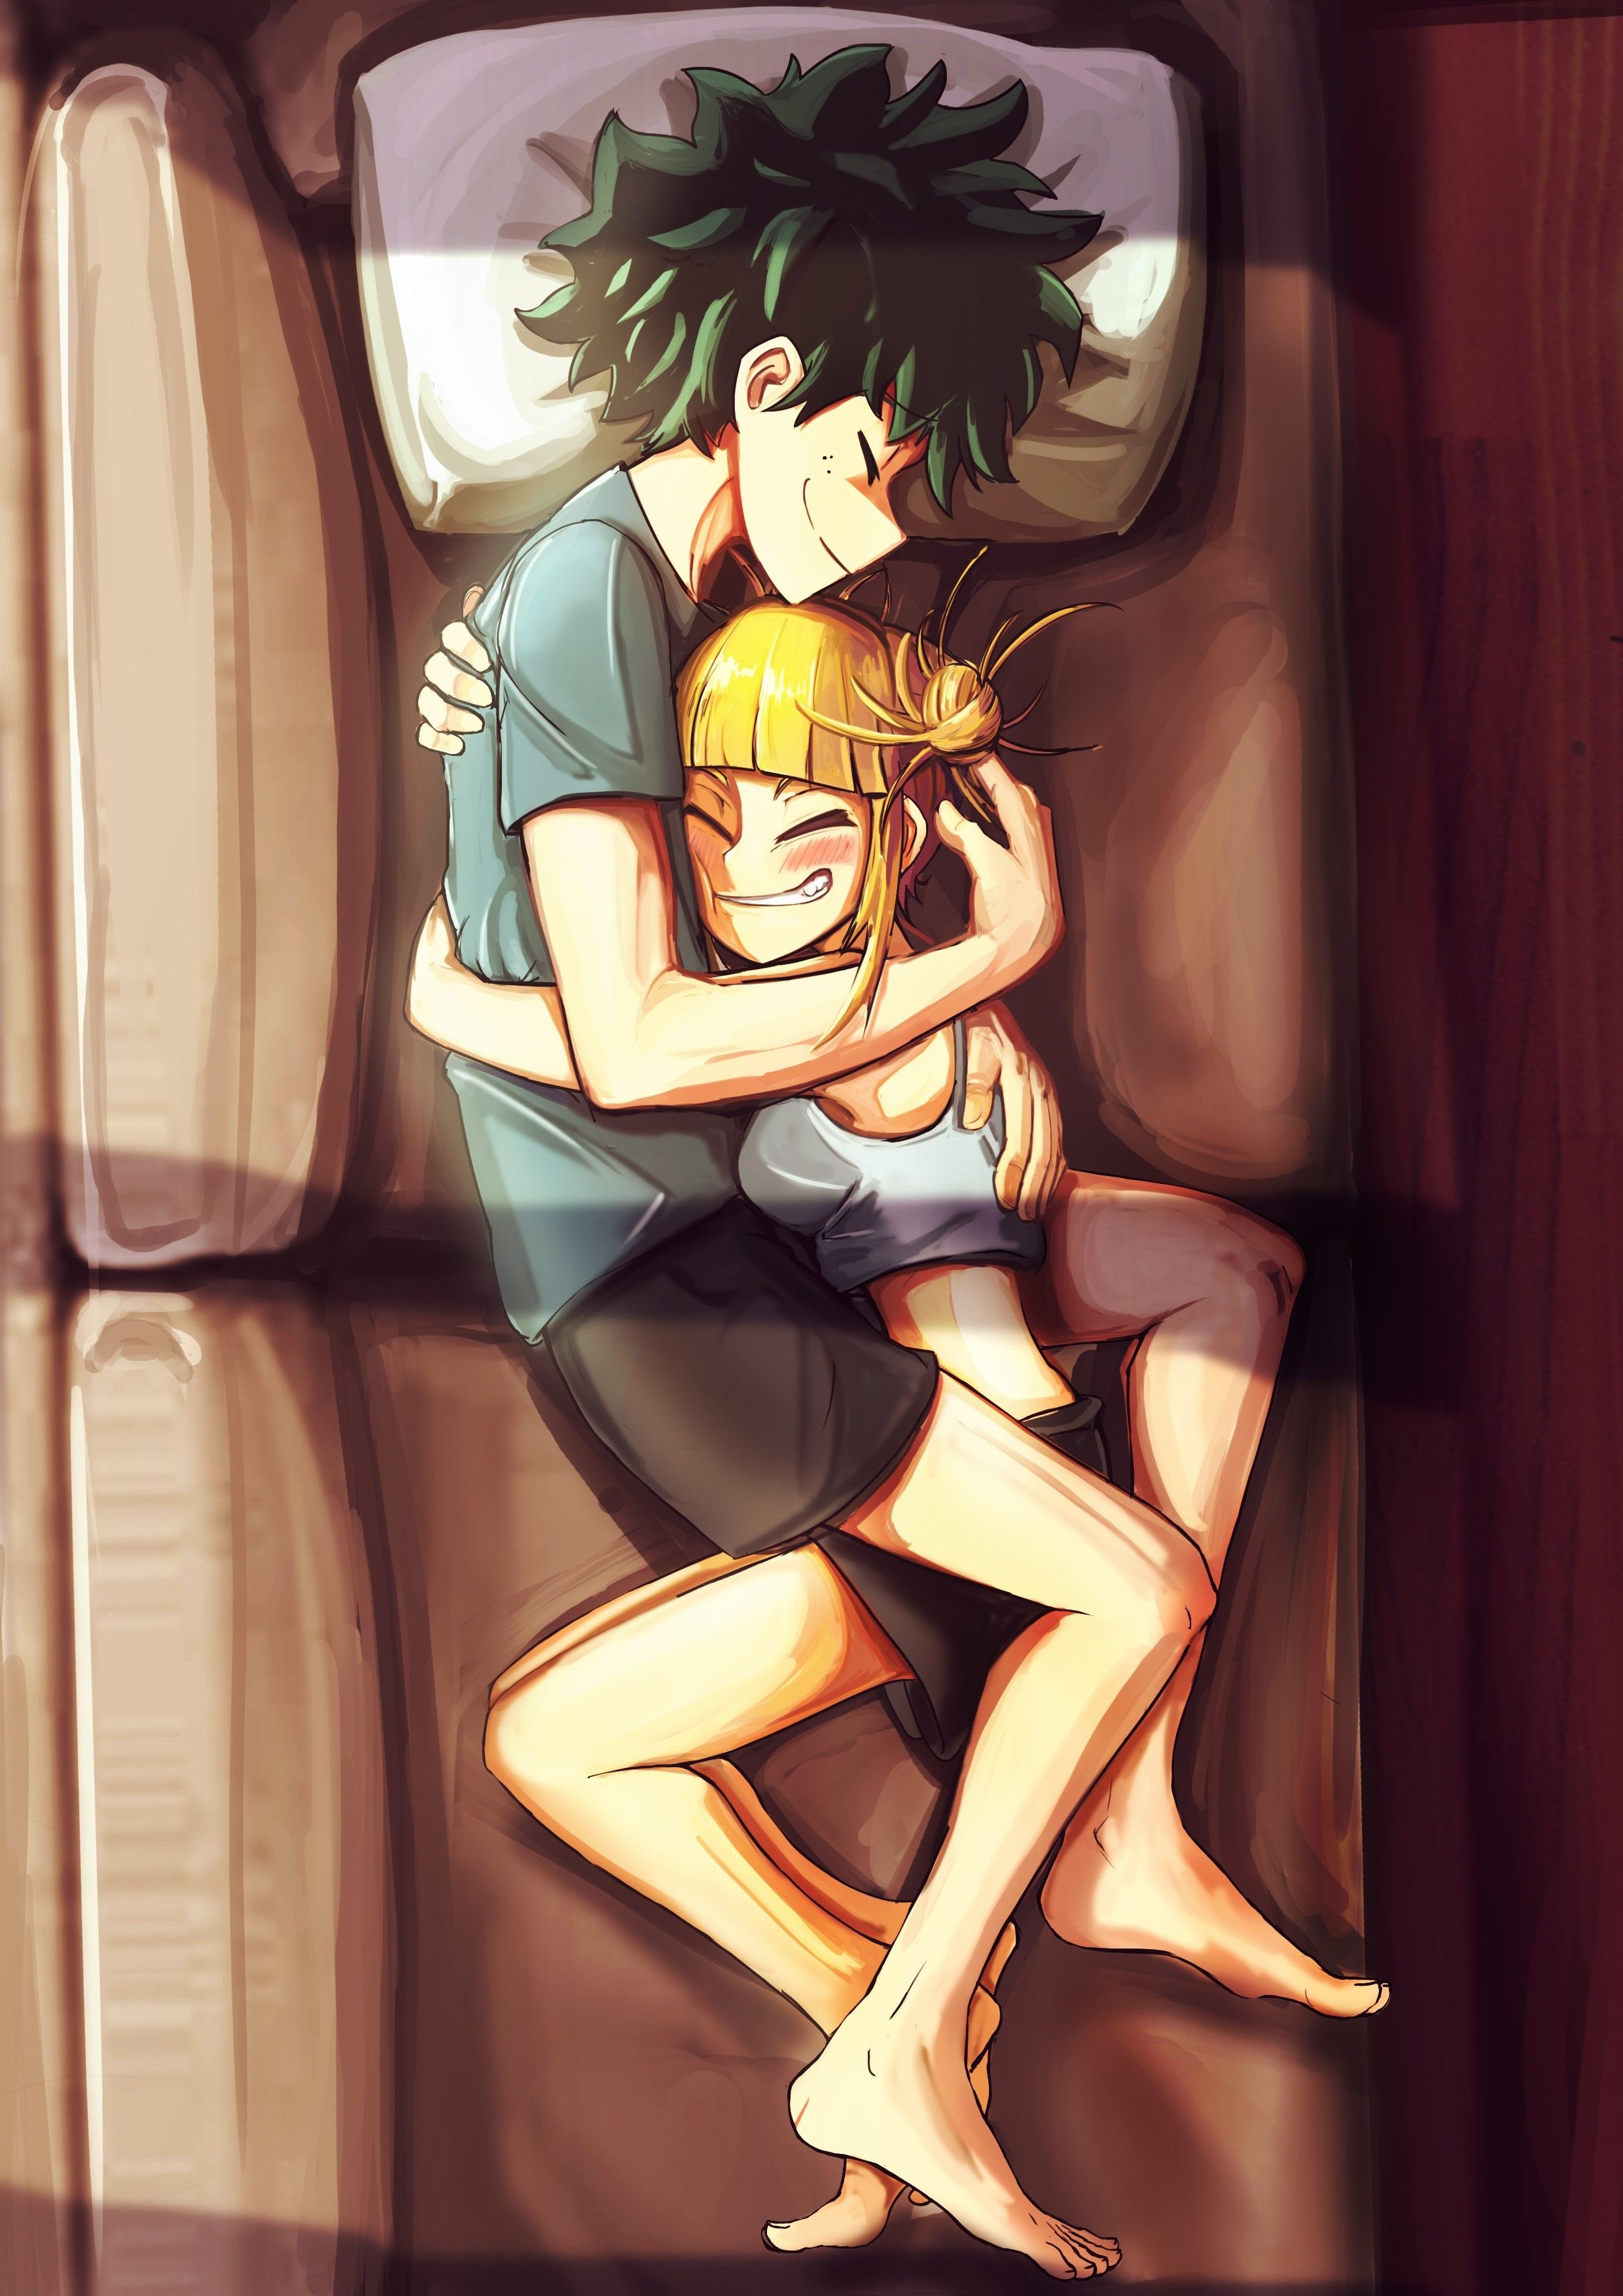 Toga Himiko X Midoriya Izuku Illustration Sleeping Together My Hero Academia Episodes Toga Villain Deku